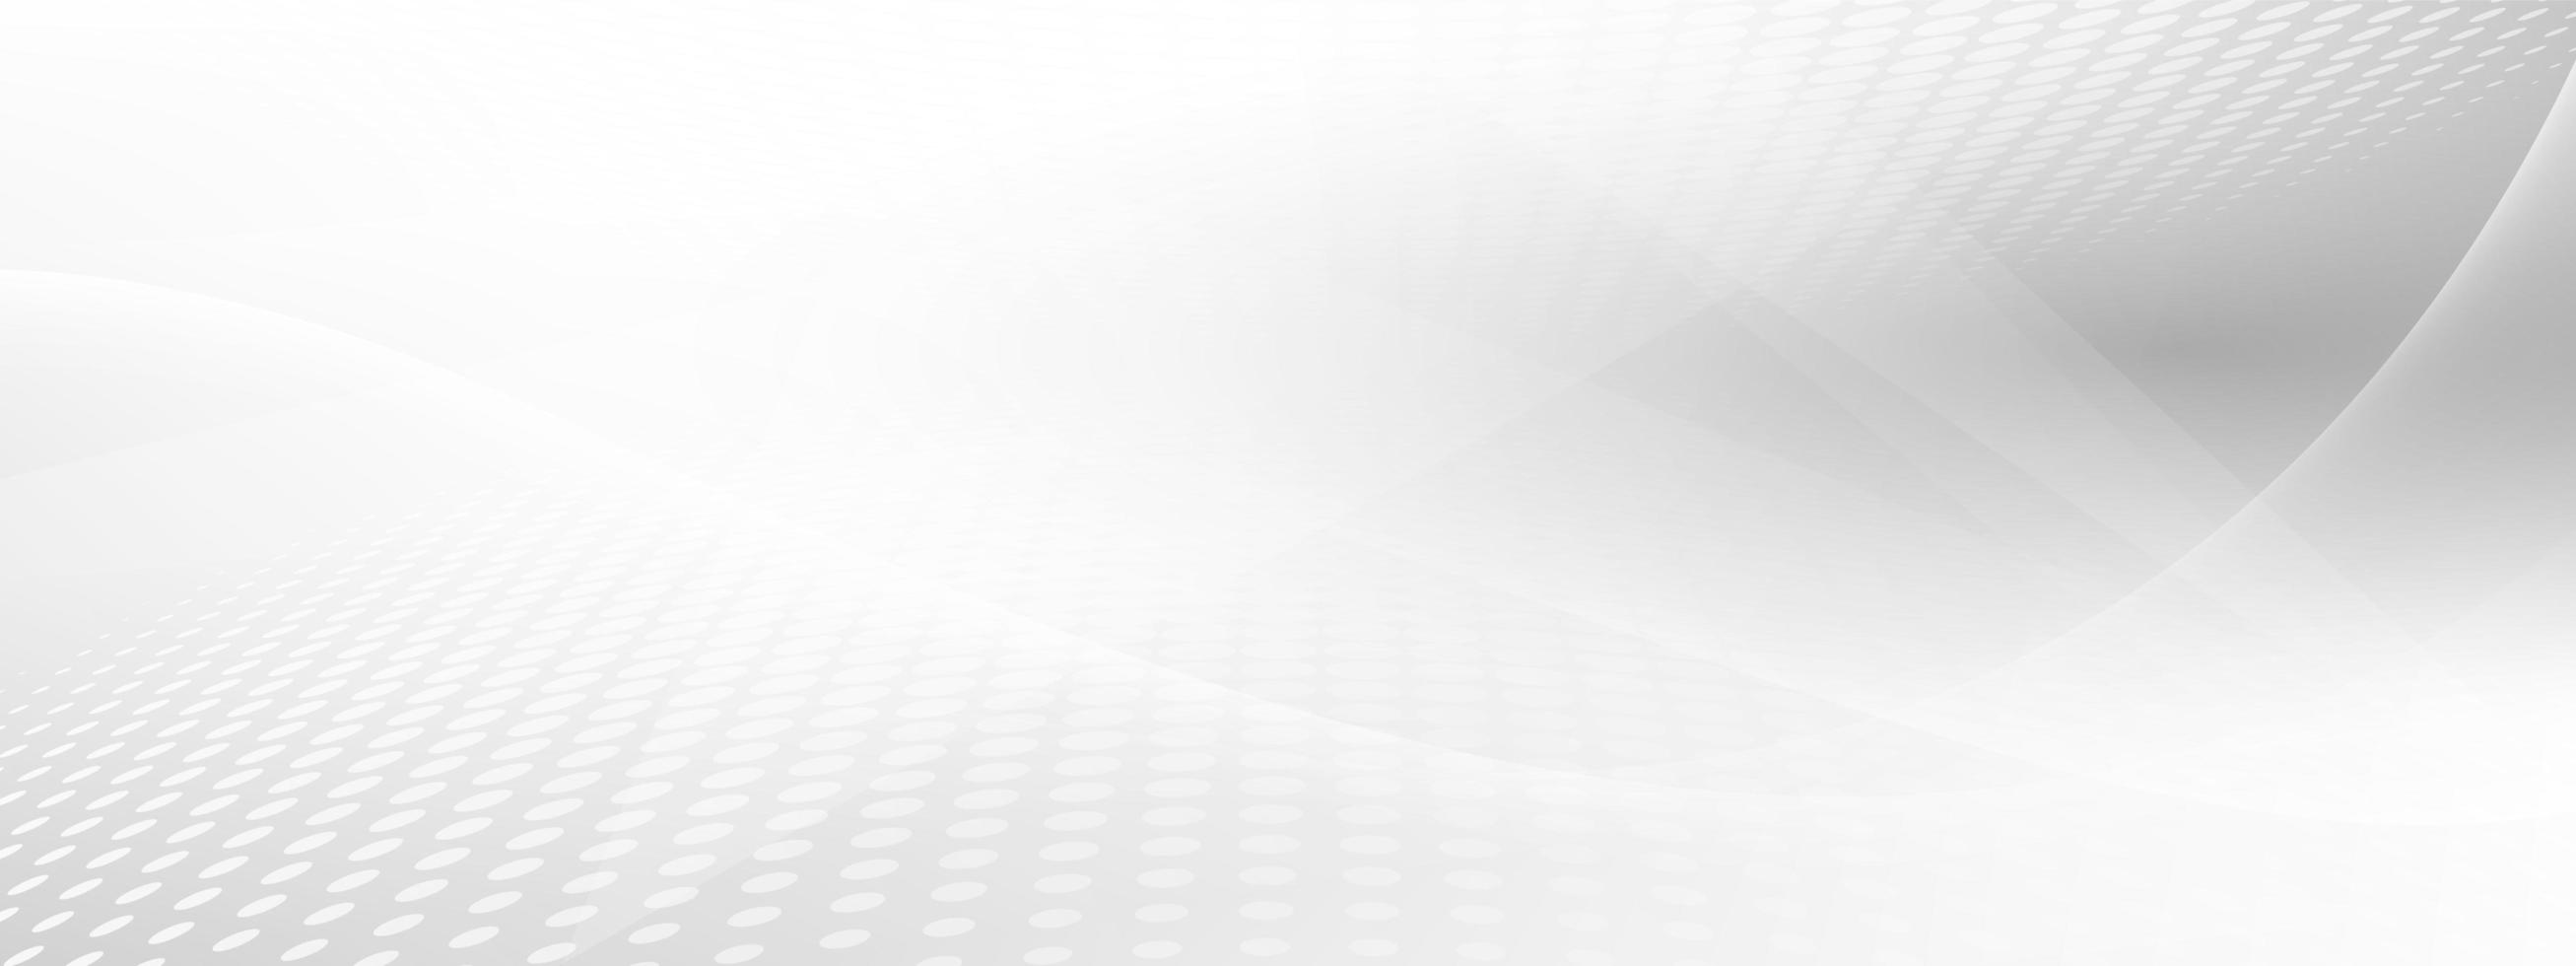 abstrakt grå bakgrundsaffisch med dynamisk design vektor